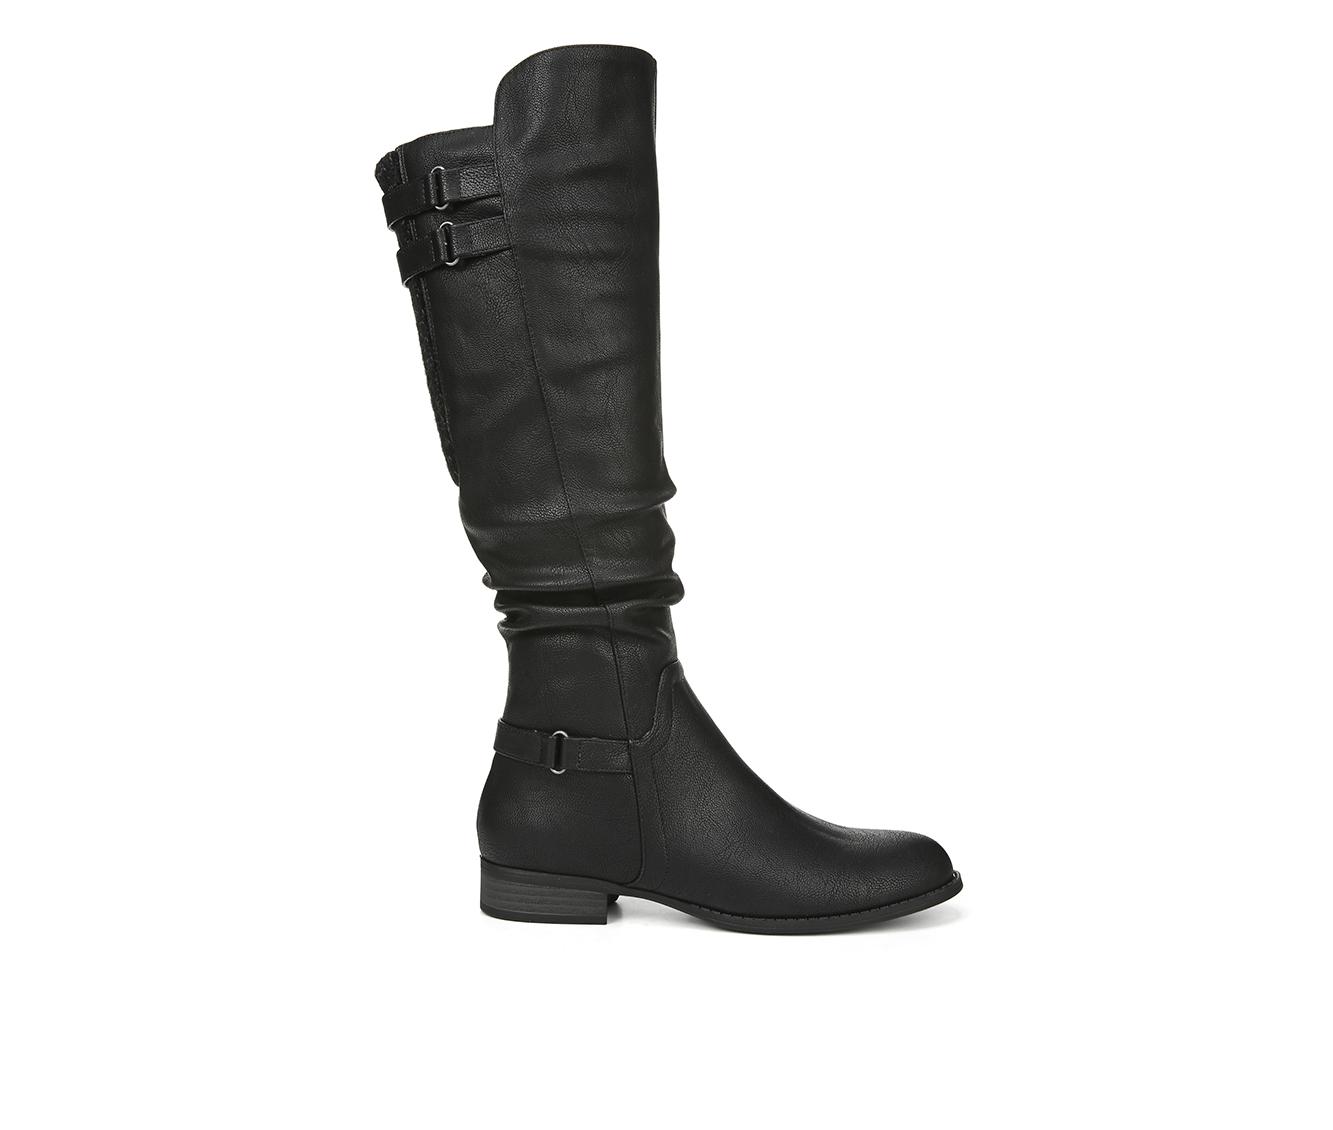 LifeStride Faunia Women's Boots (Black - Faux Leather)